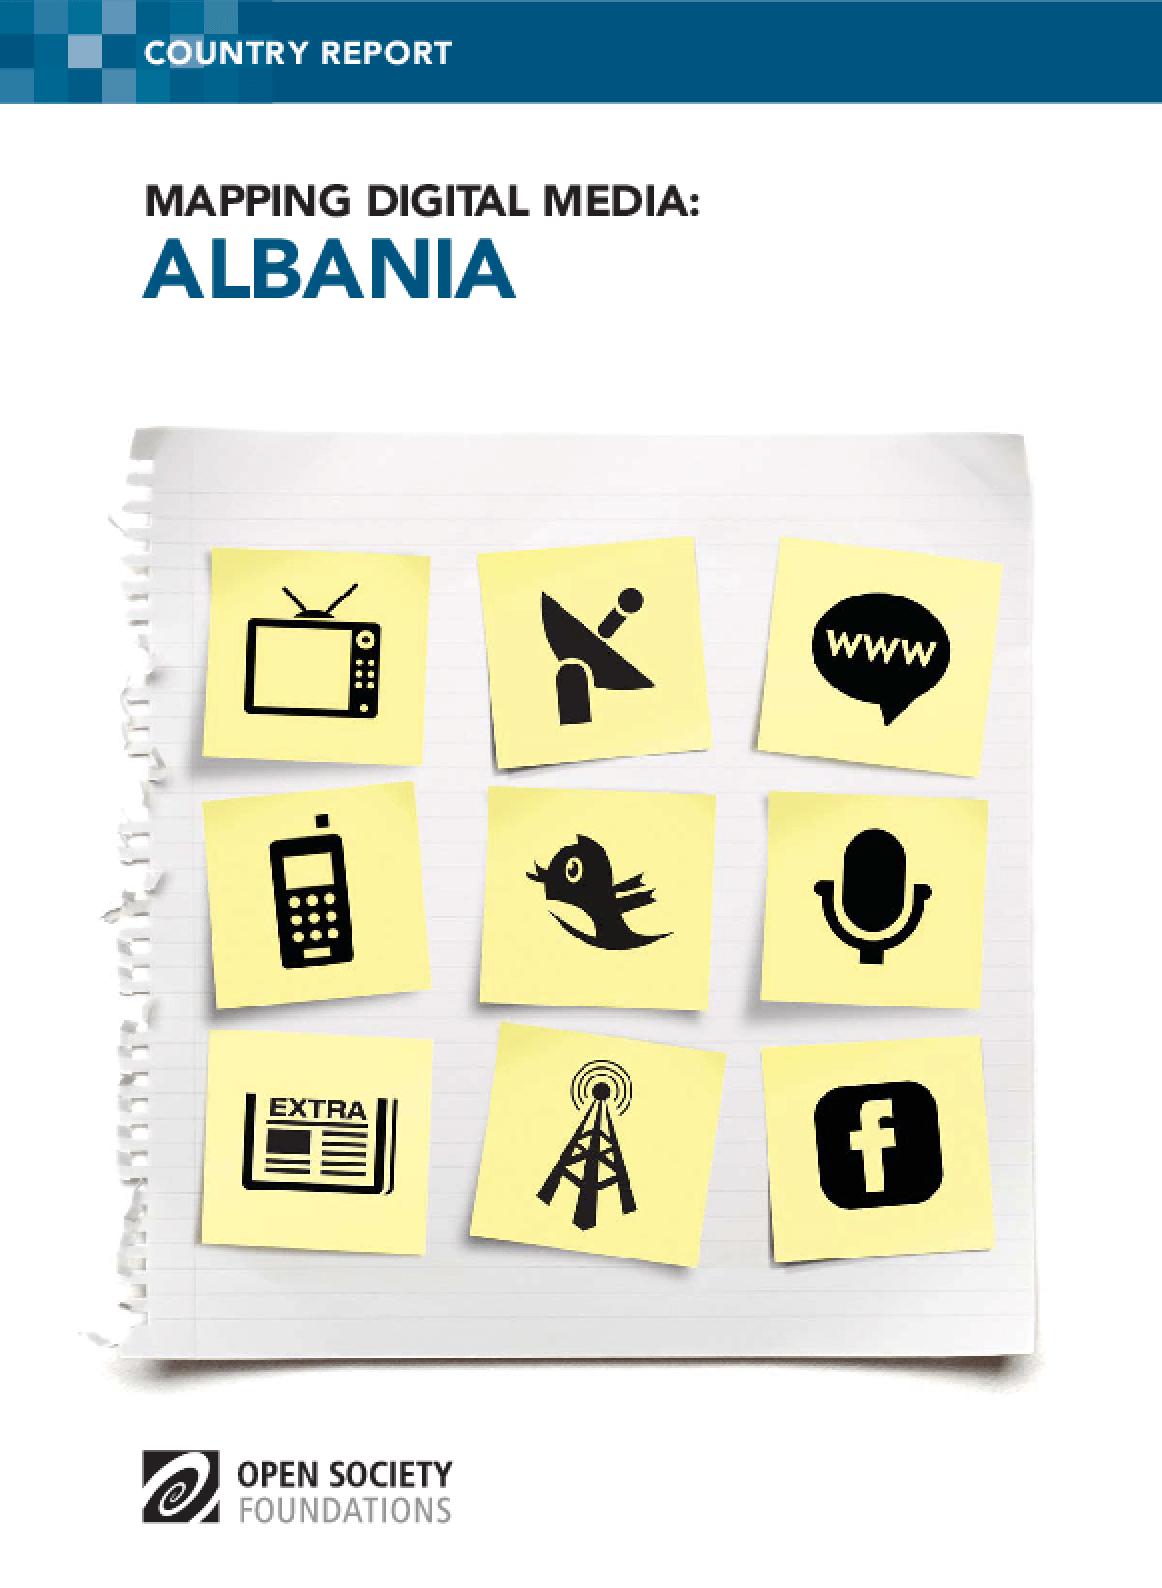 Mapping Digital Media: Albania